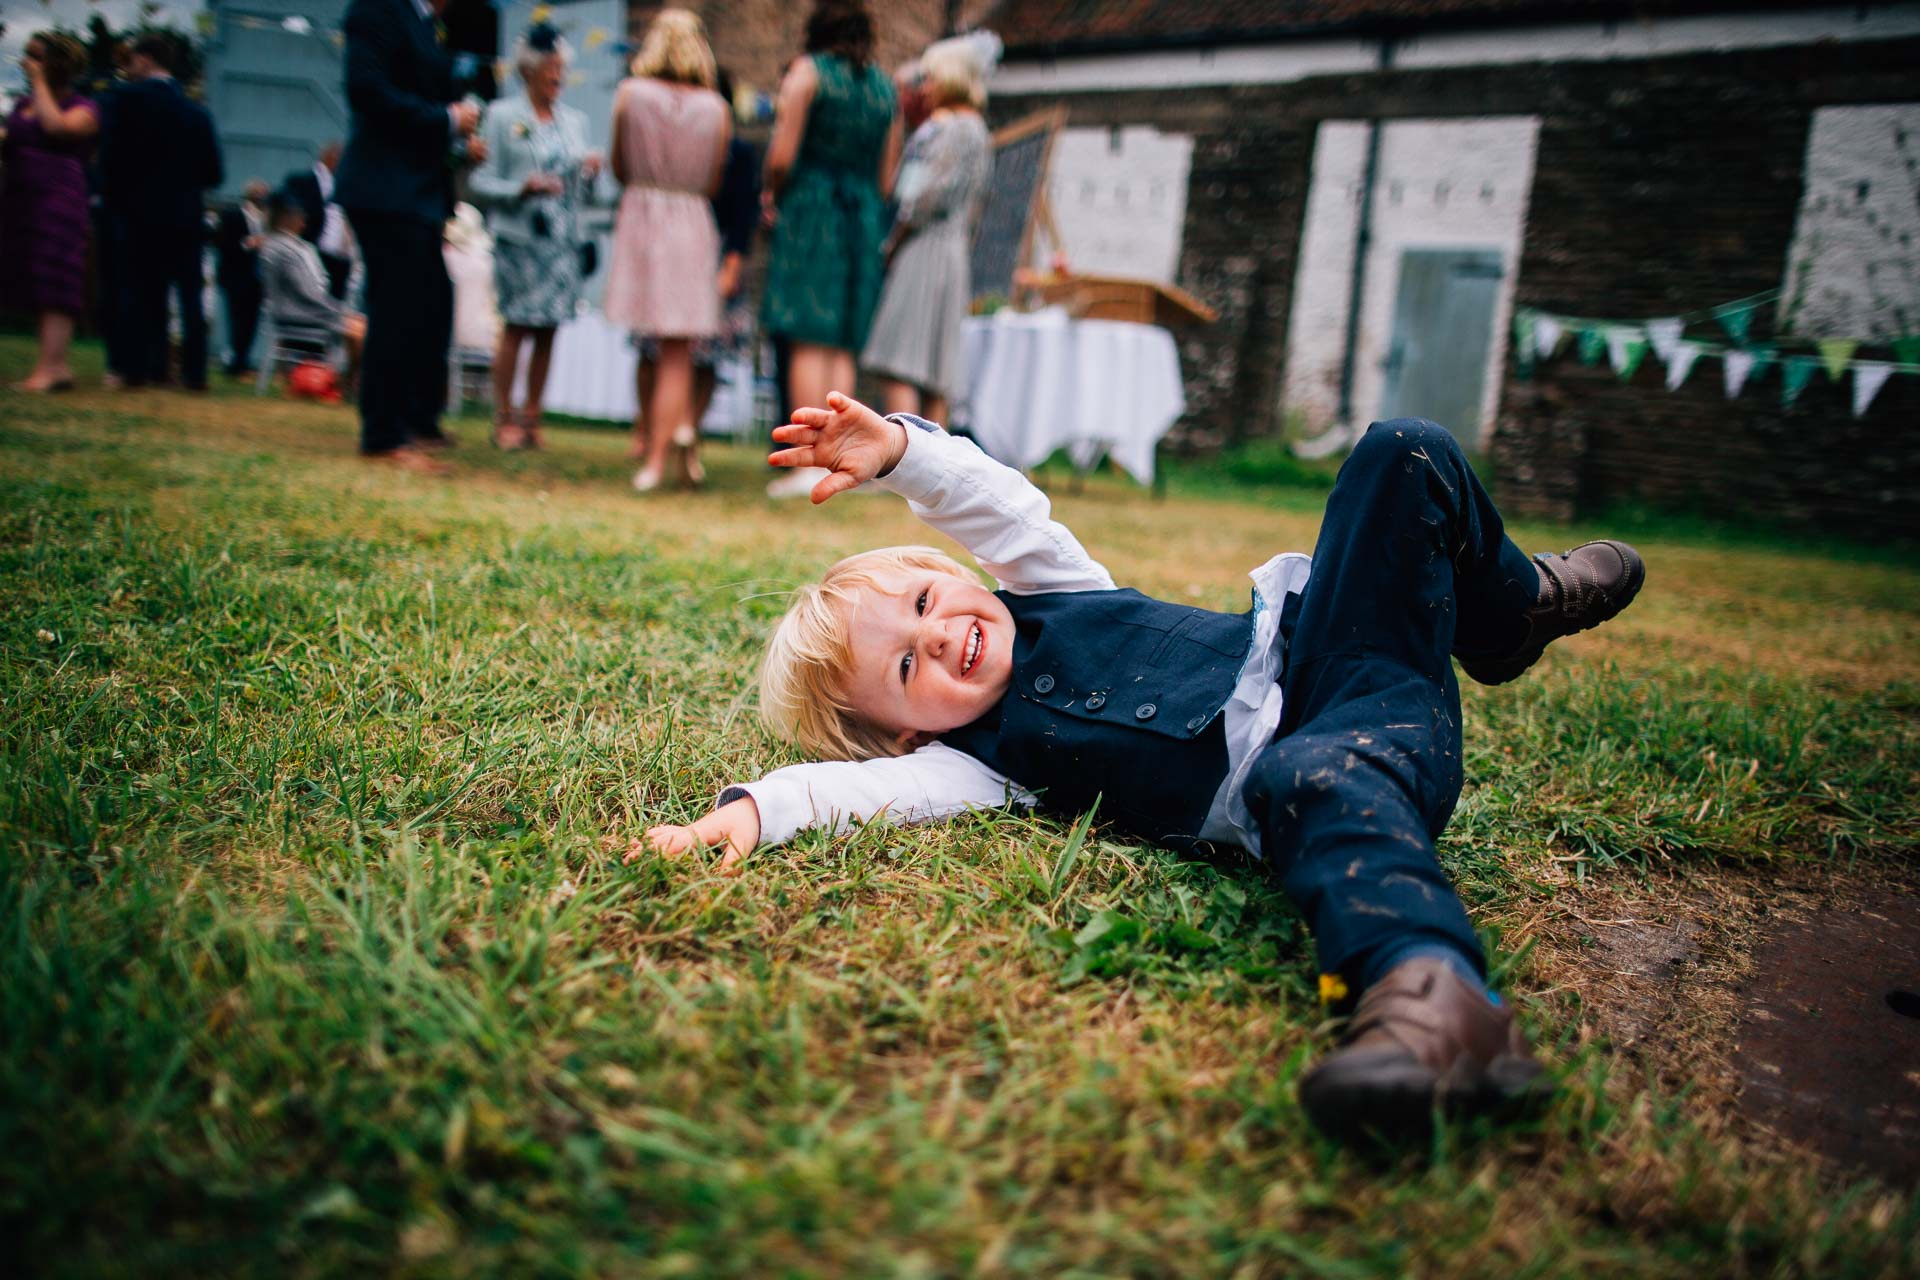 winterbourne-medieval-barn-wedding-photography-emma-andrew-70